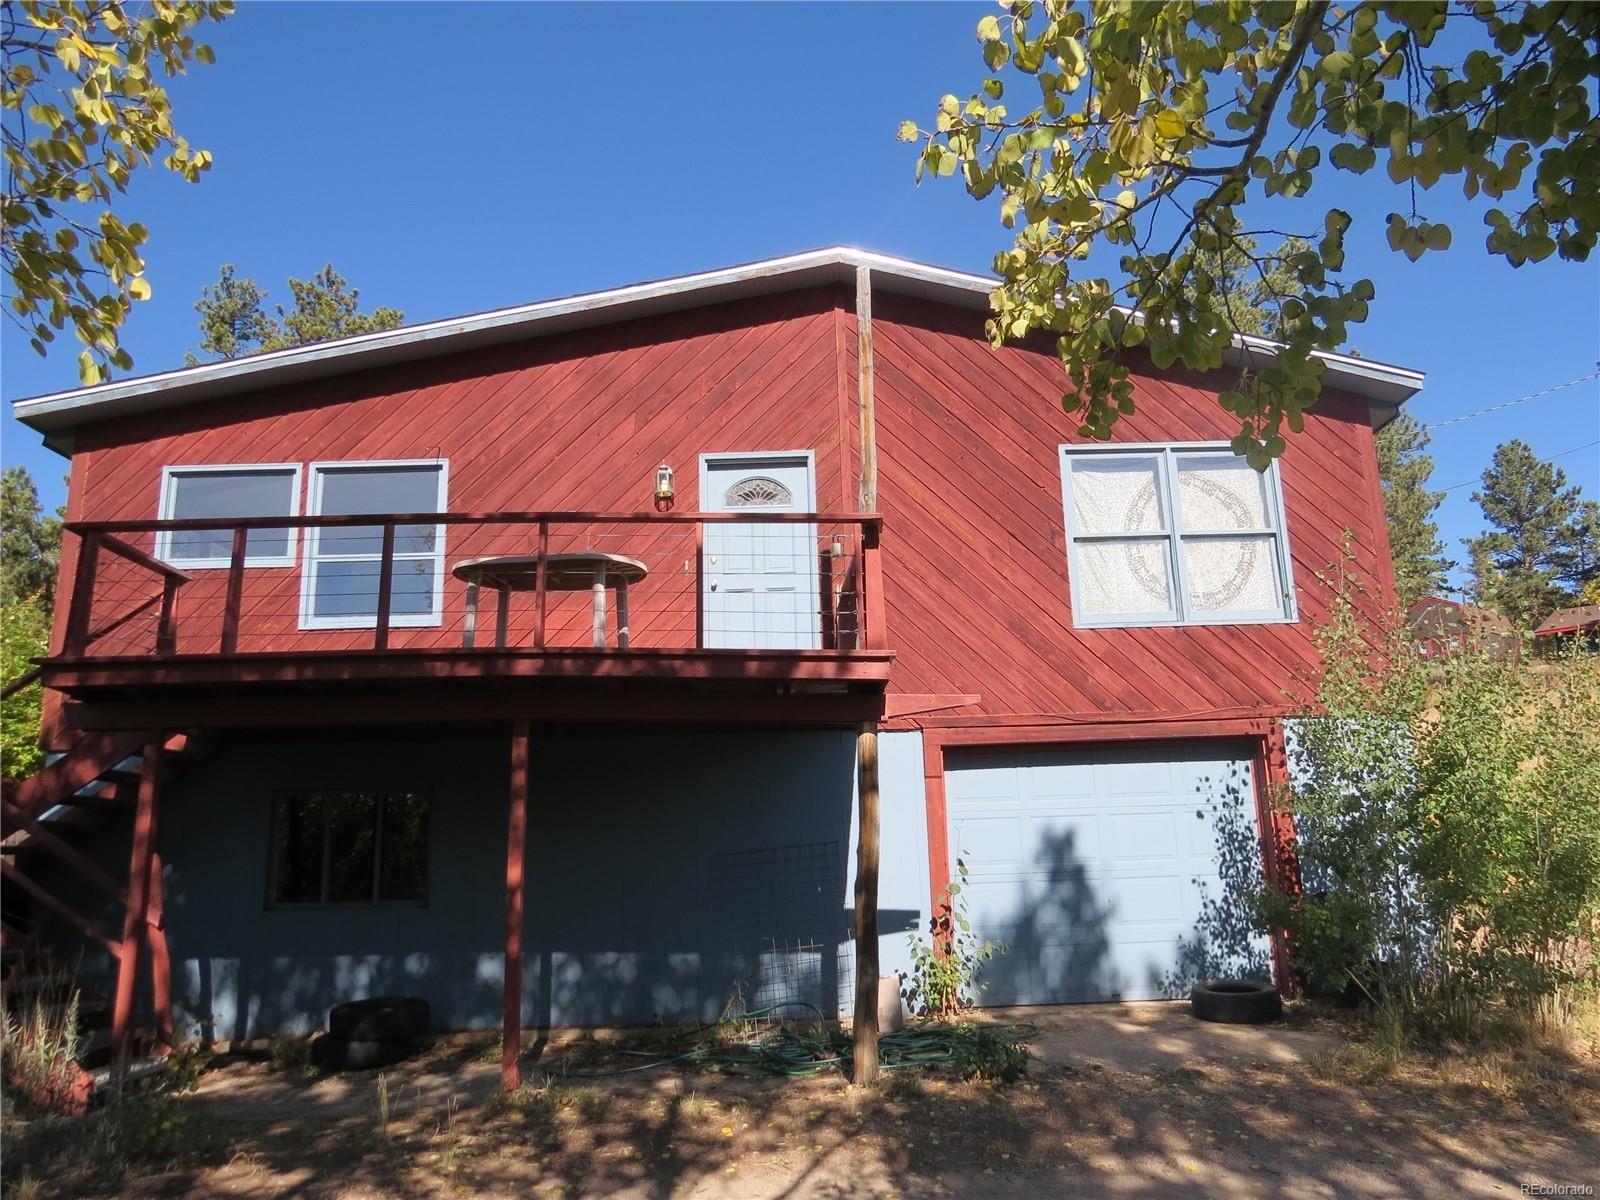 MLS# 9251839 - 9 - 50 Navajo Trail, Nederland, CO 80466